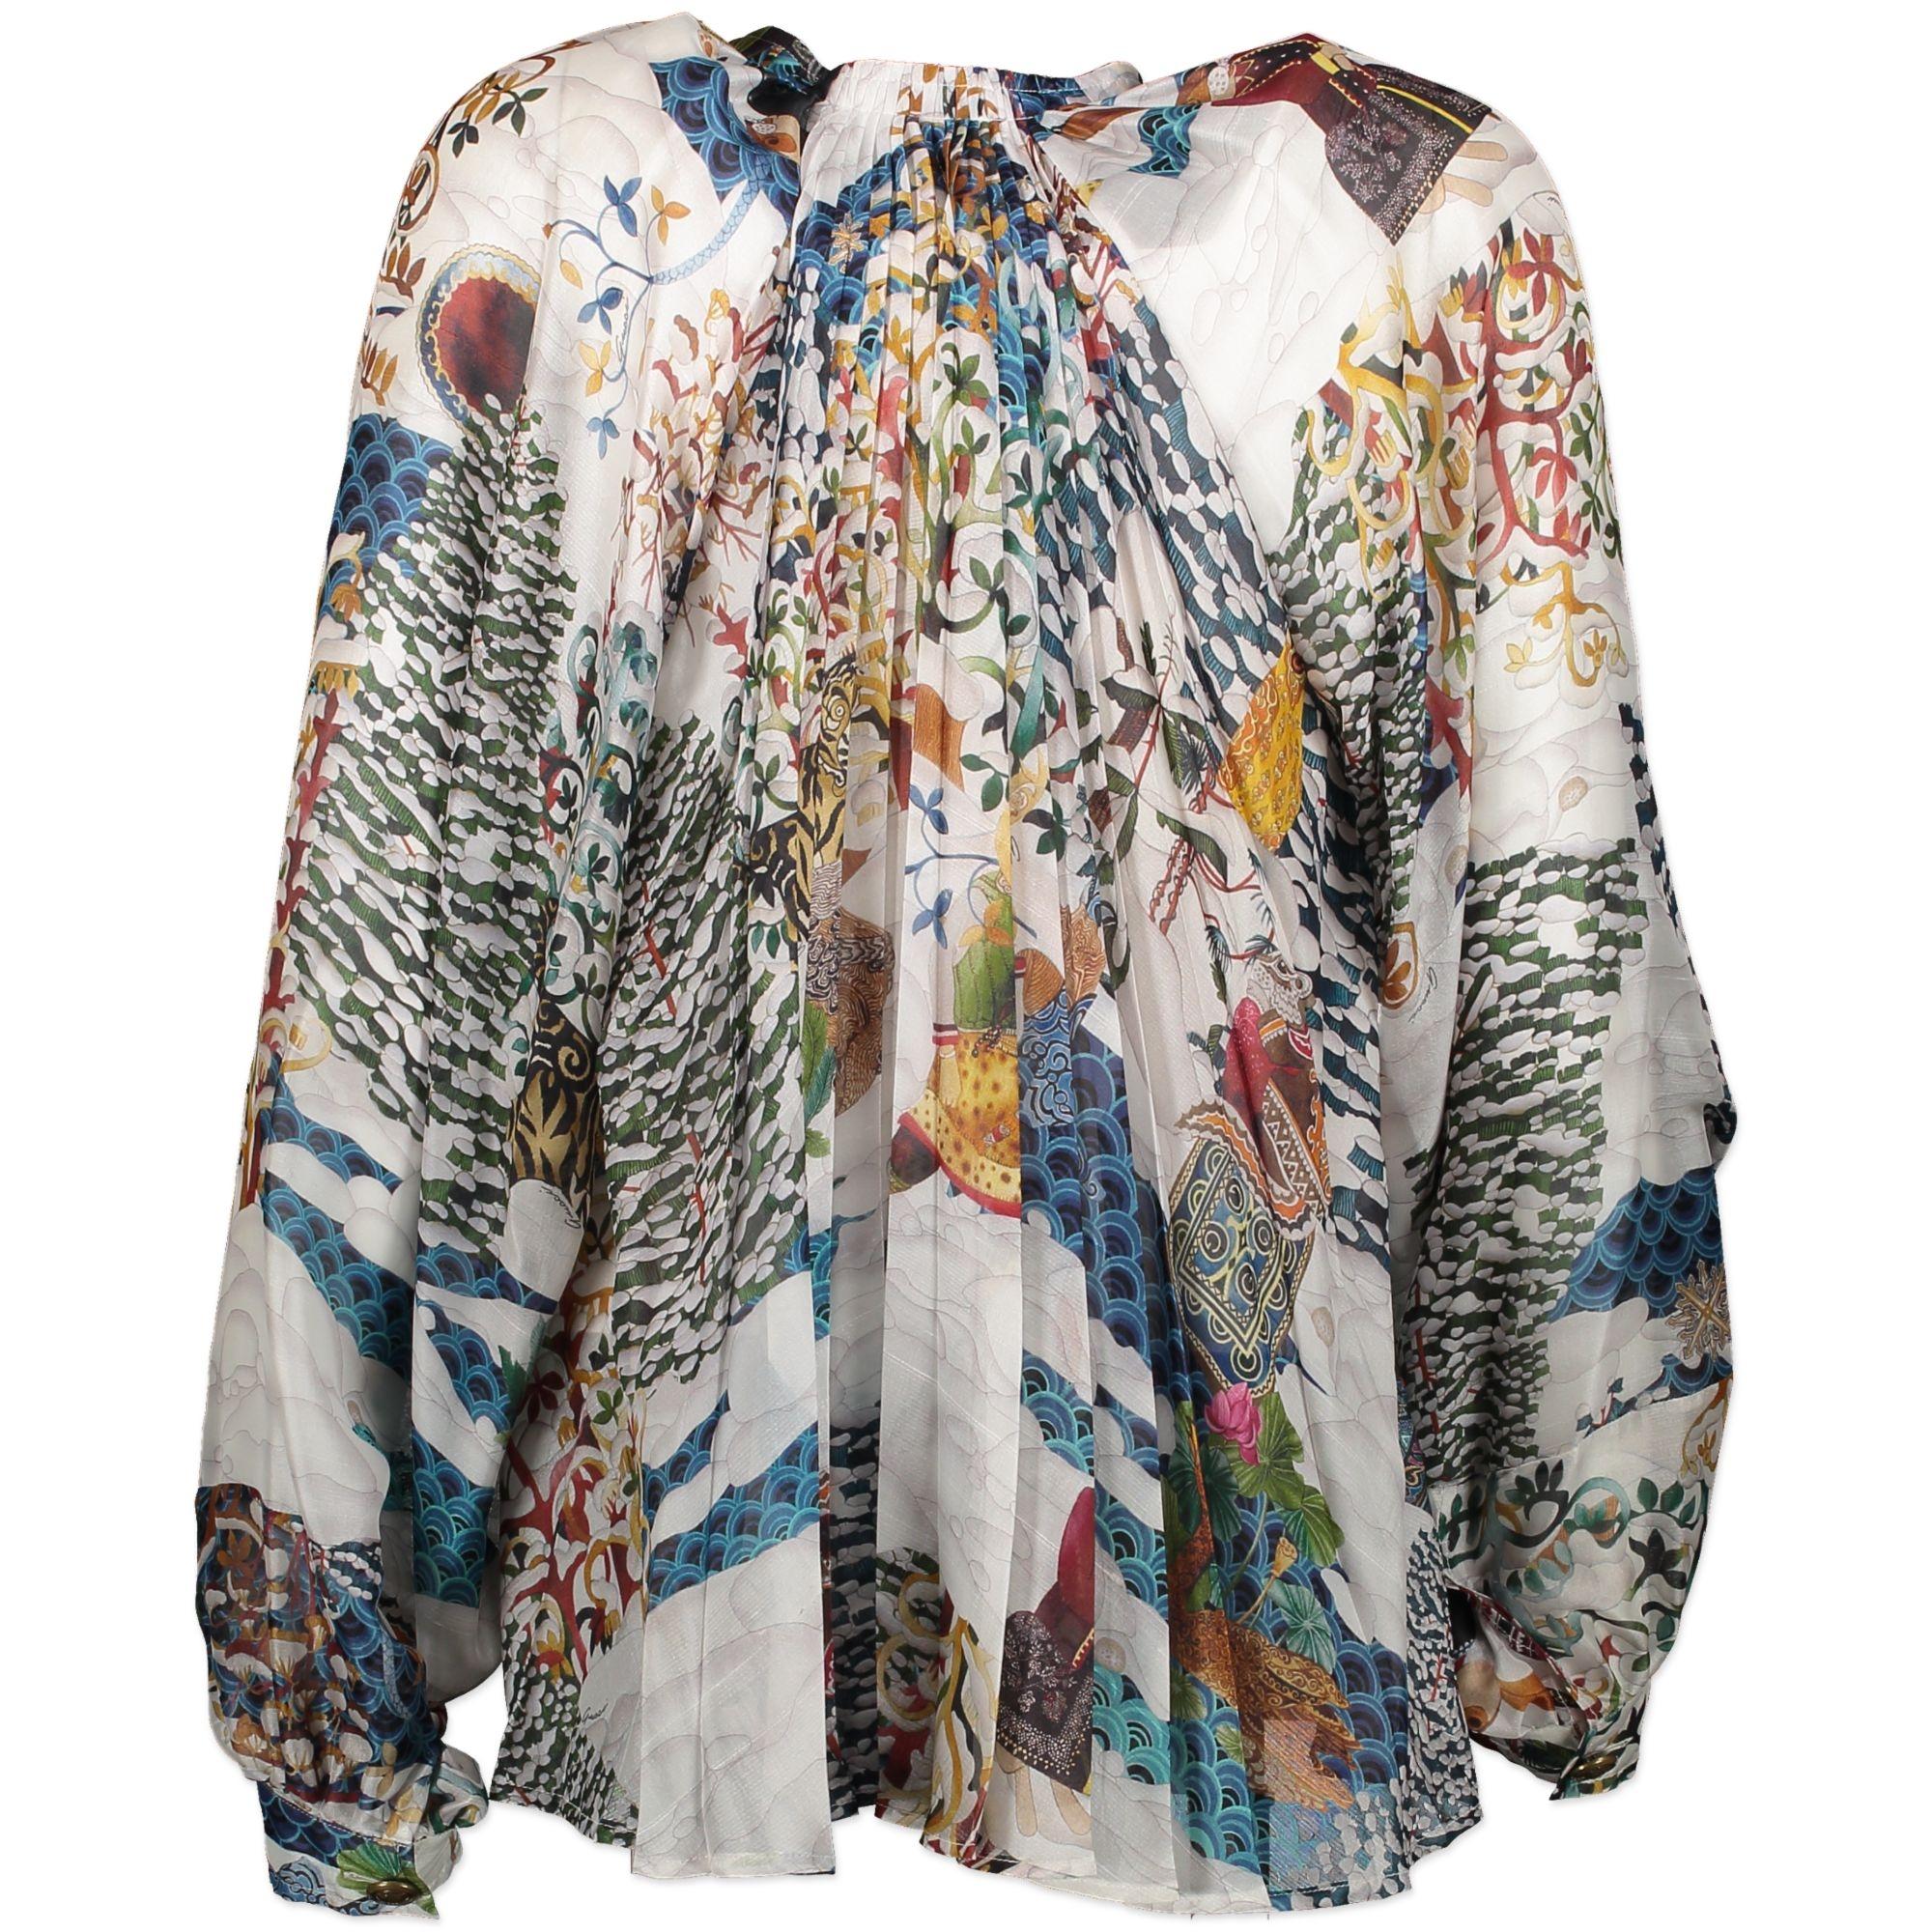 Gucci 100% Silk Printed Blouse